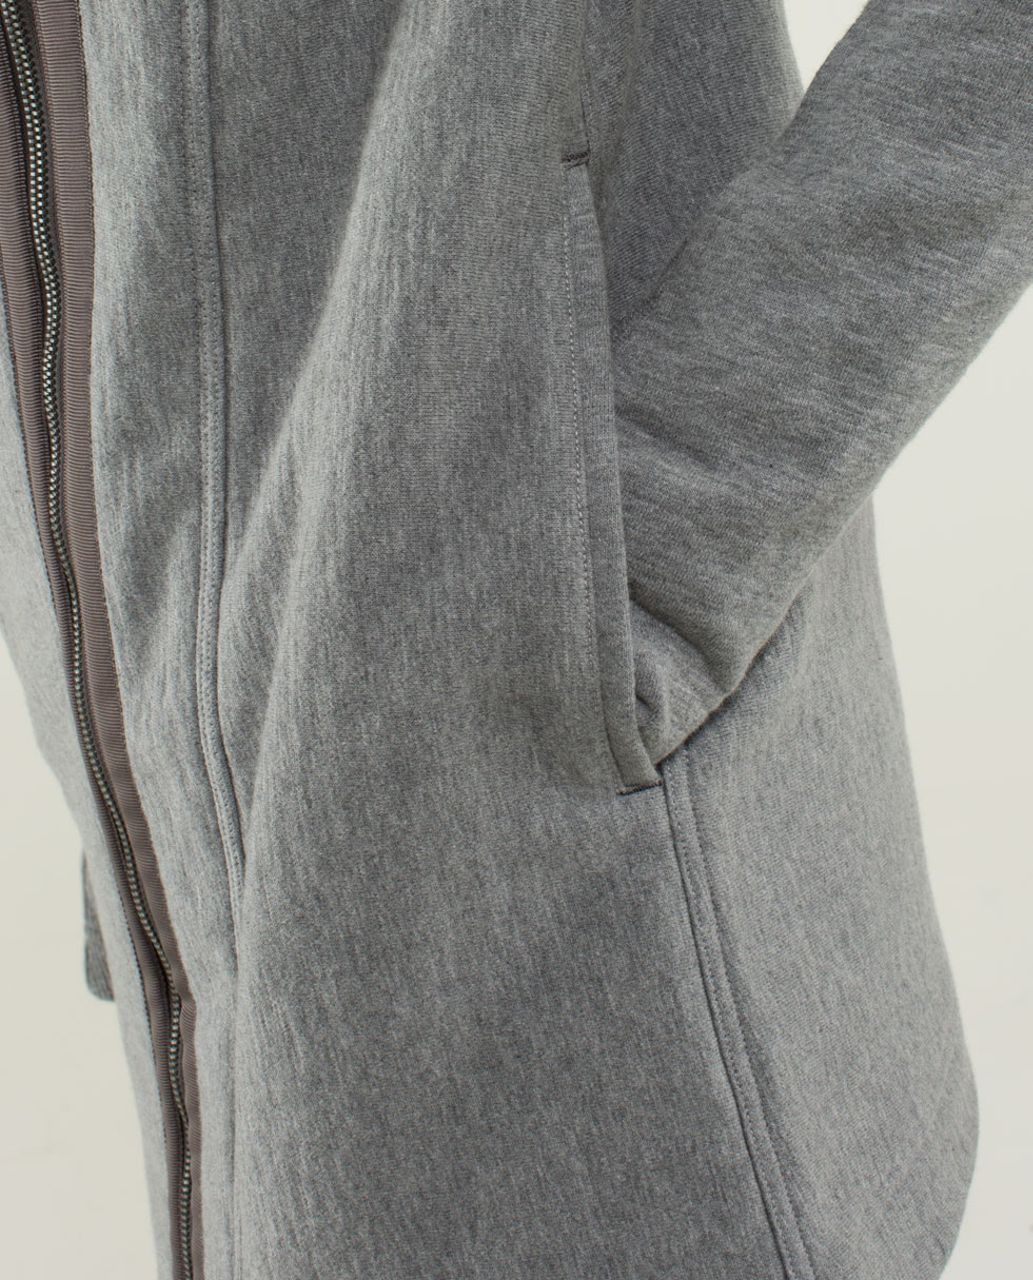 Lululemon Virasana Blanket Wrap - Heathered Medium Grey / Silver Spoon / Heathered Medium Grey